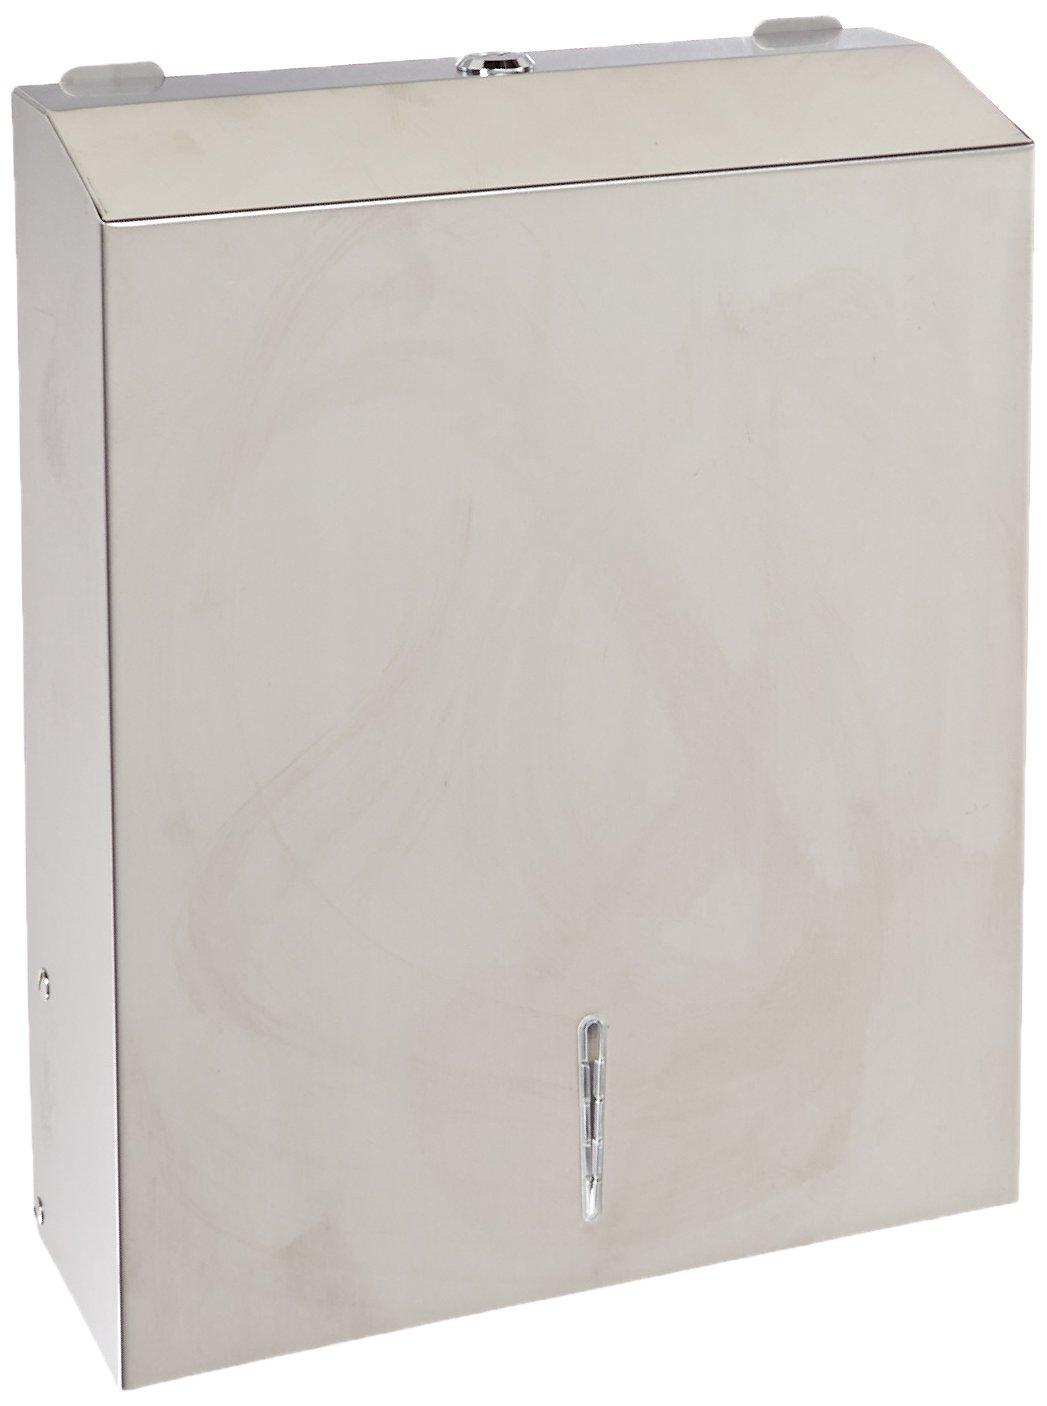 Genuine Joe GJO02198 Stainless Steel C Fold/Multifold Hand Towel Dispenser, 15-1/2'' Length x 4'' Width x 11.3'' Height, Silver